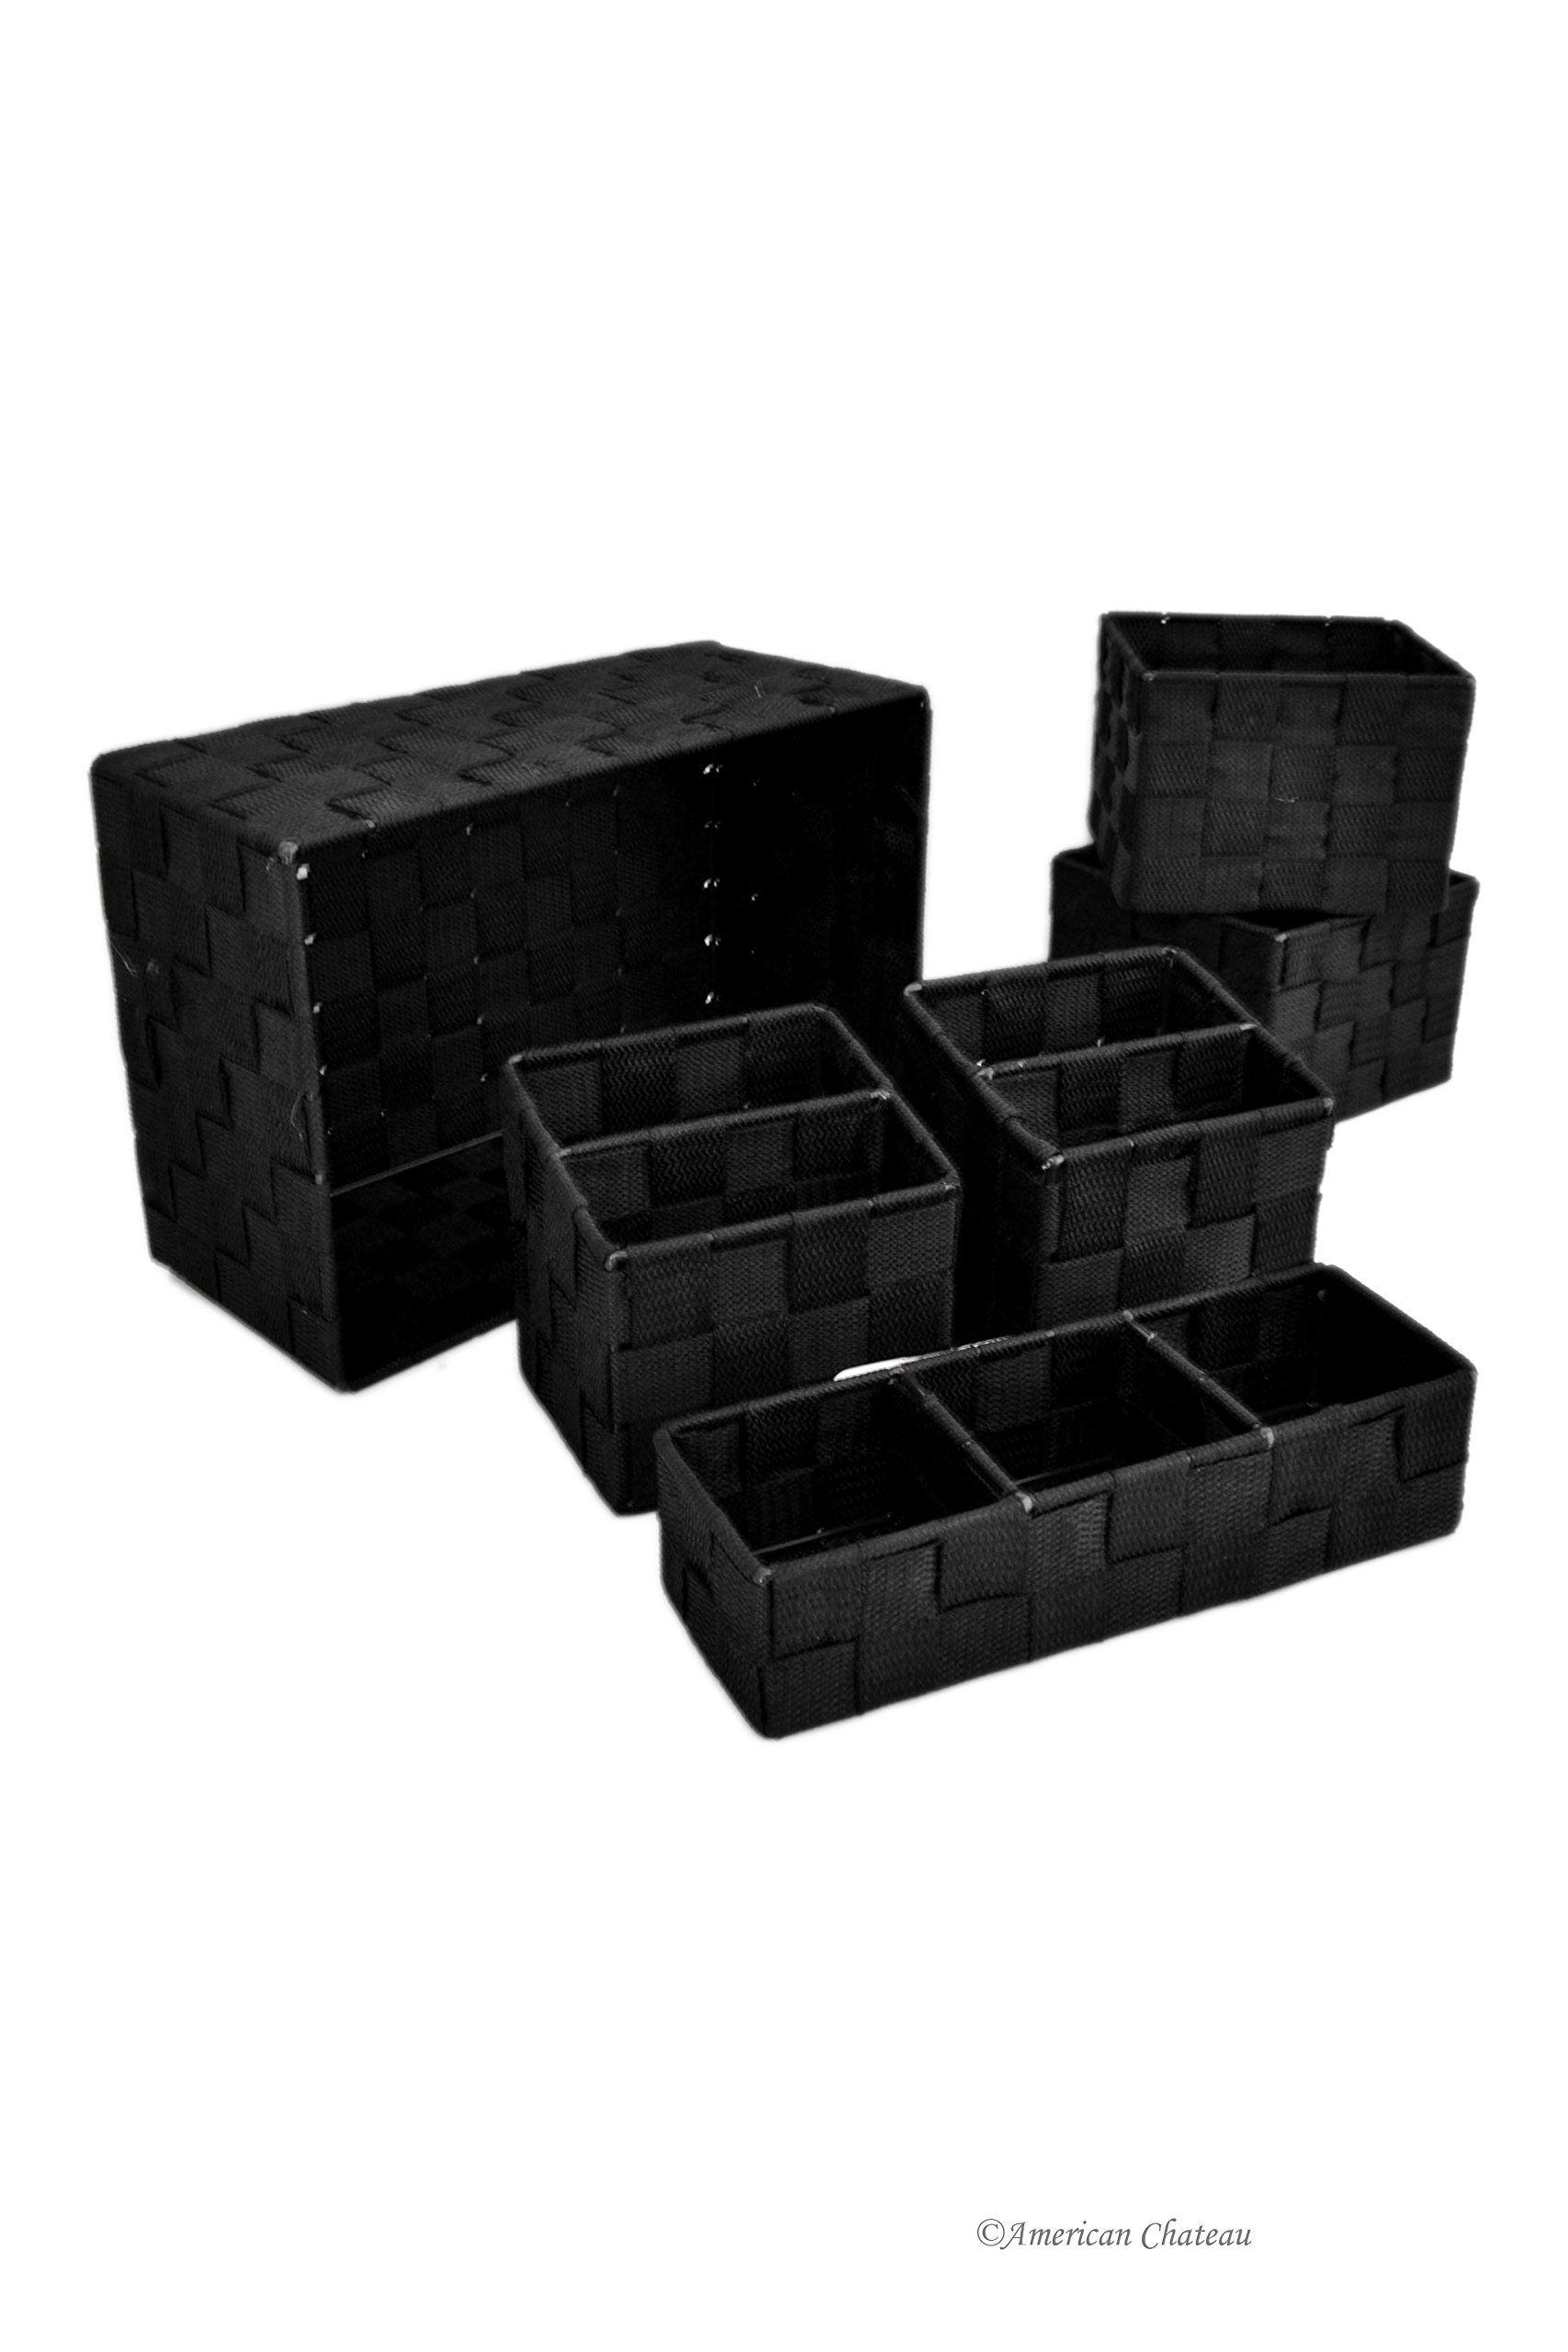 office storage baskets. Amazon.com - Set 6 Black Kitchen/Office Woven Nylon Storage Baskets Cabinet Drawer Office O